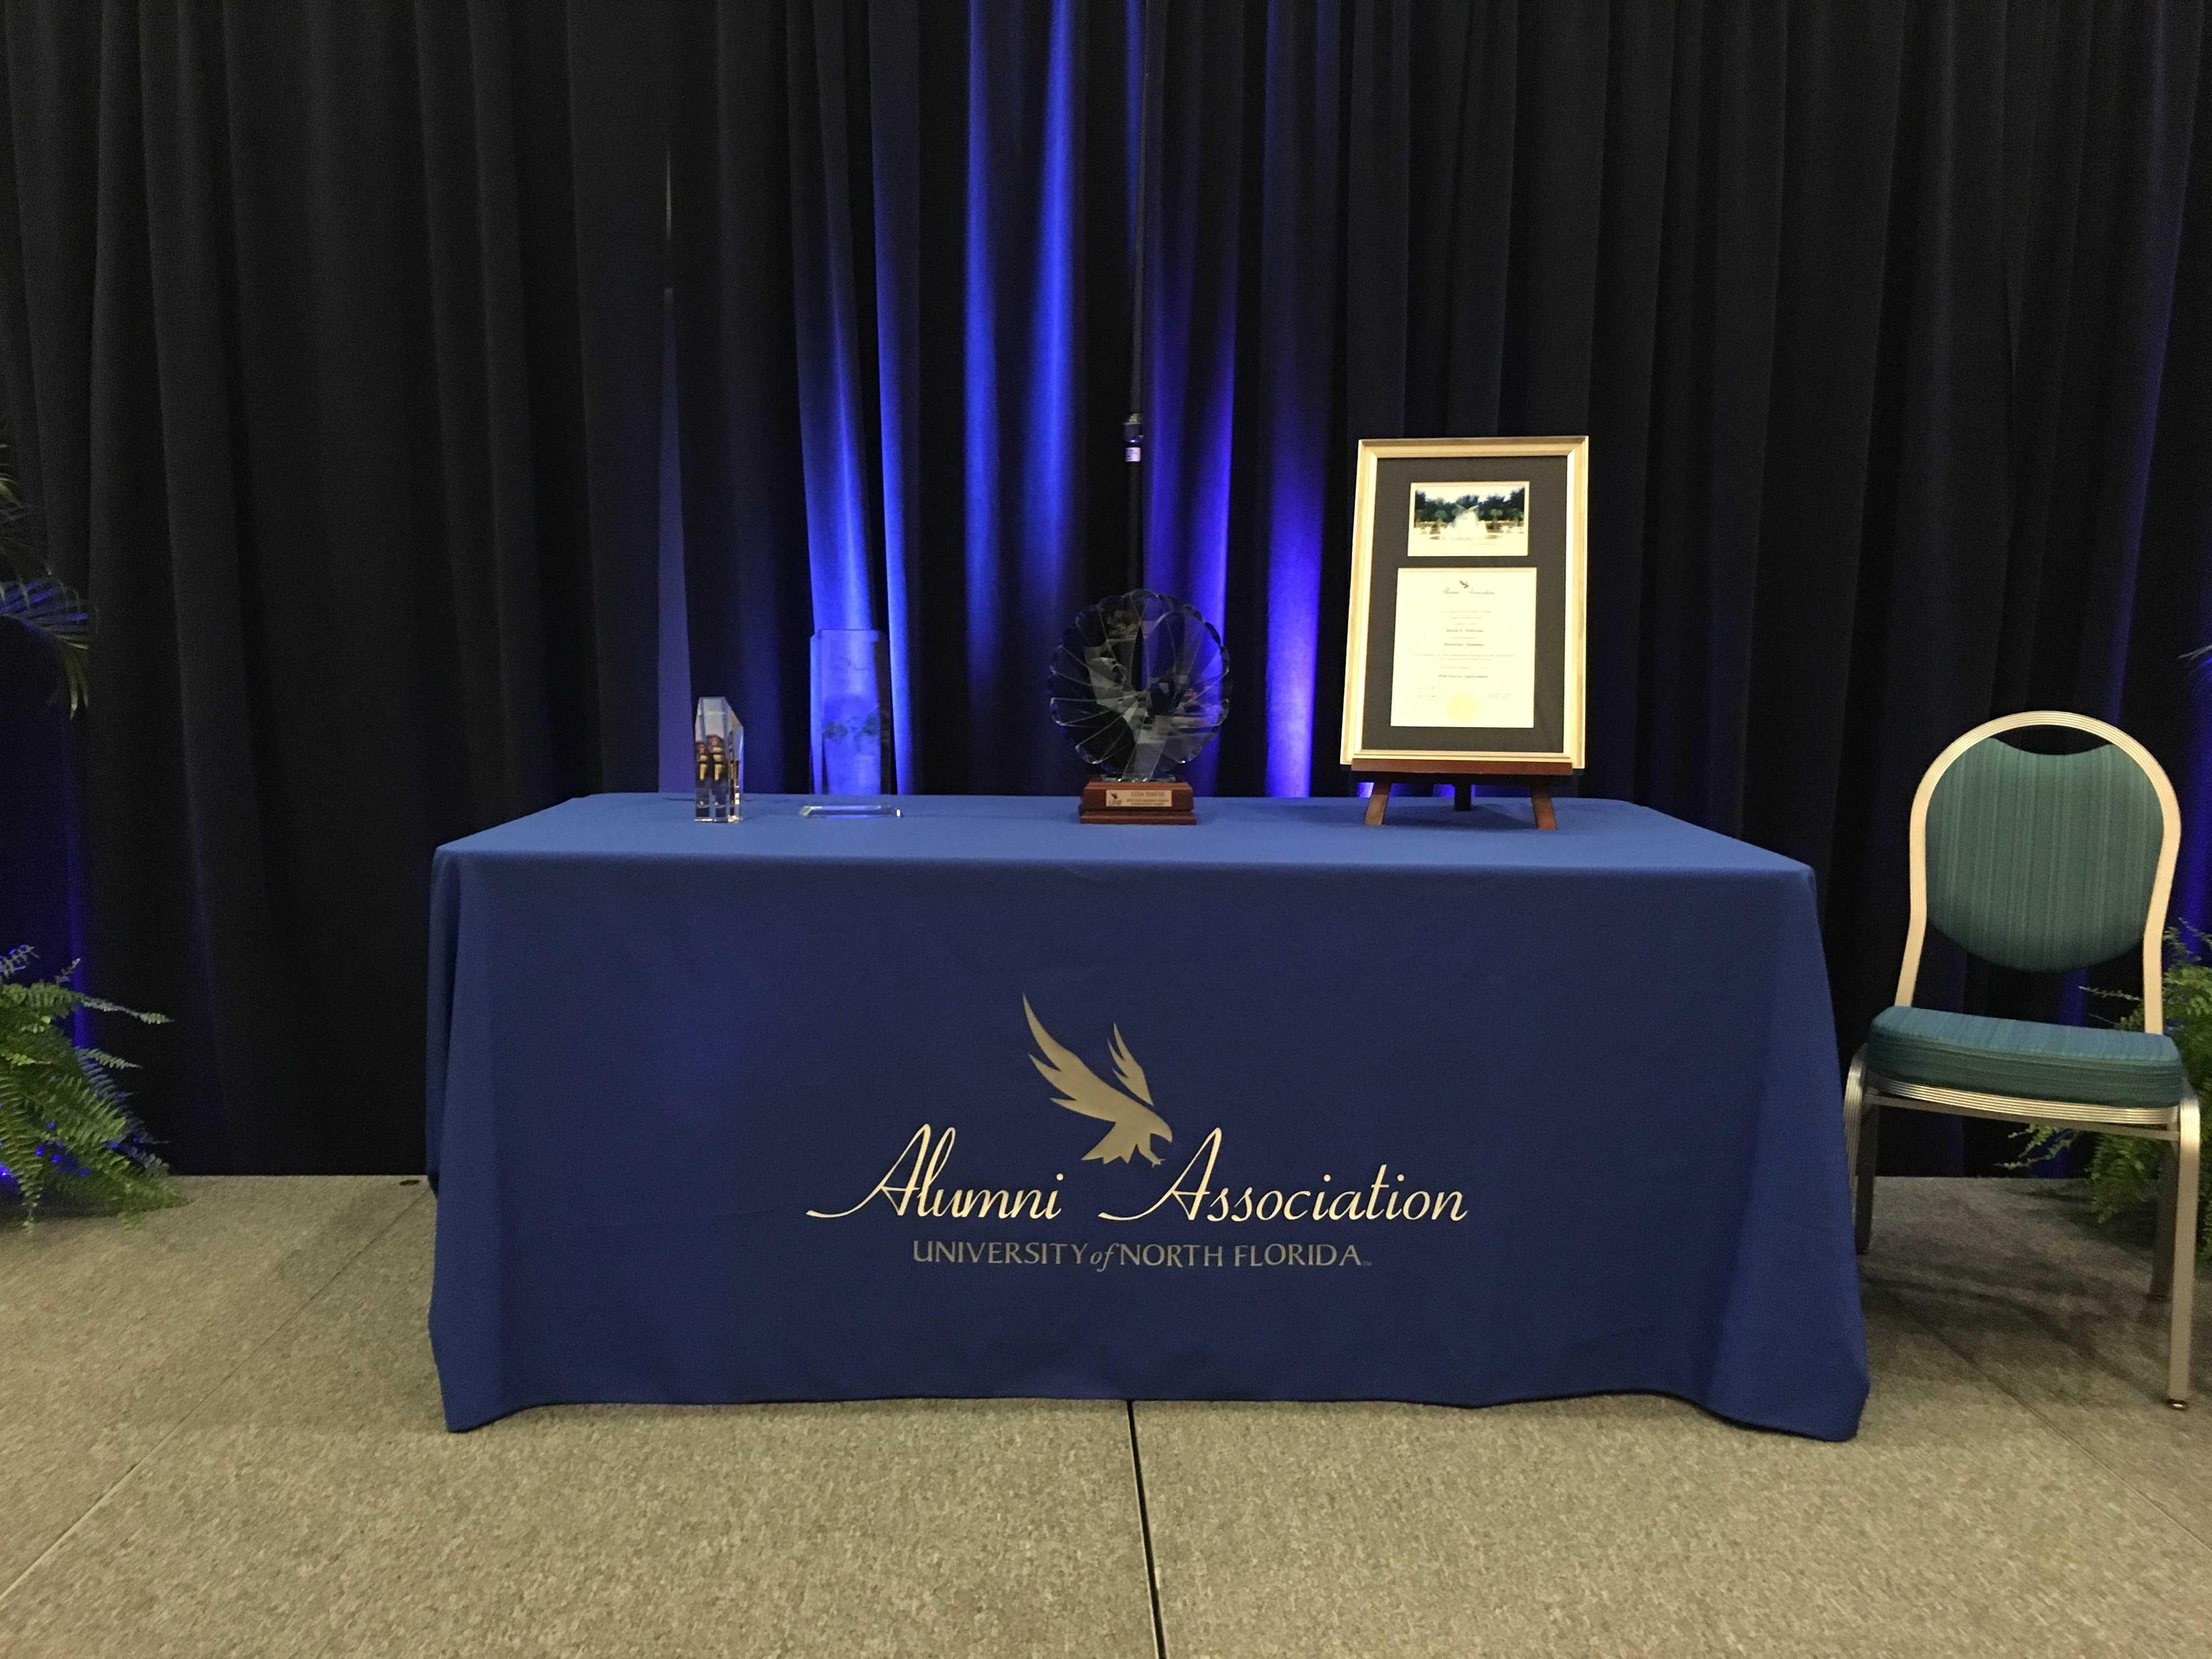 Alumni swoop up awards during Homecoming Week